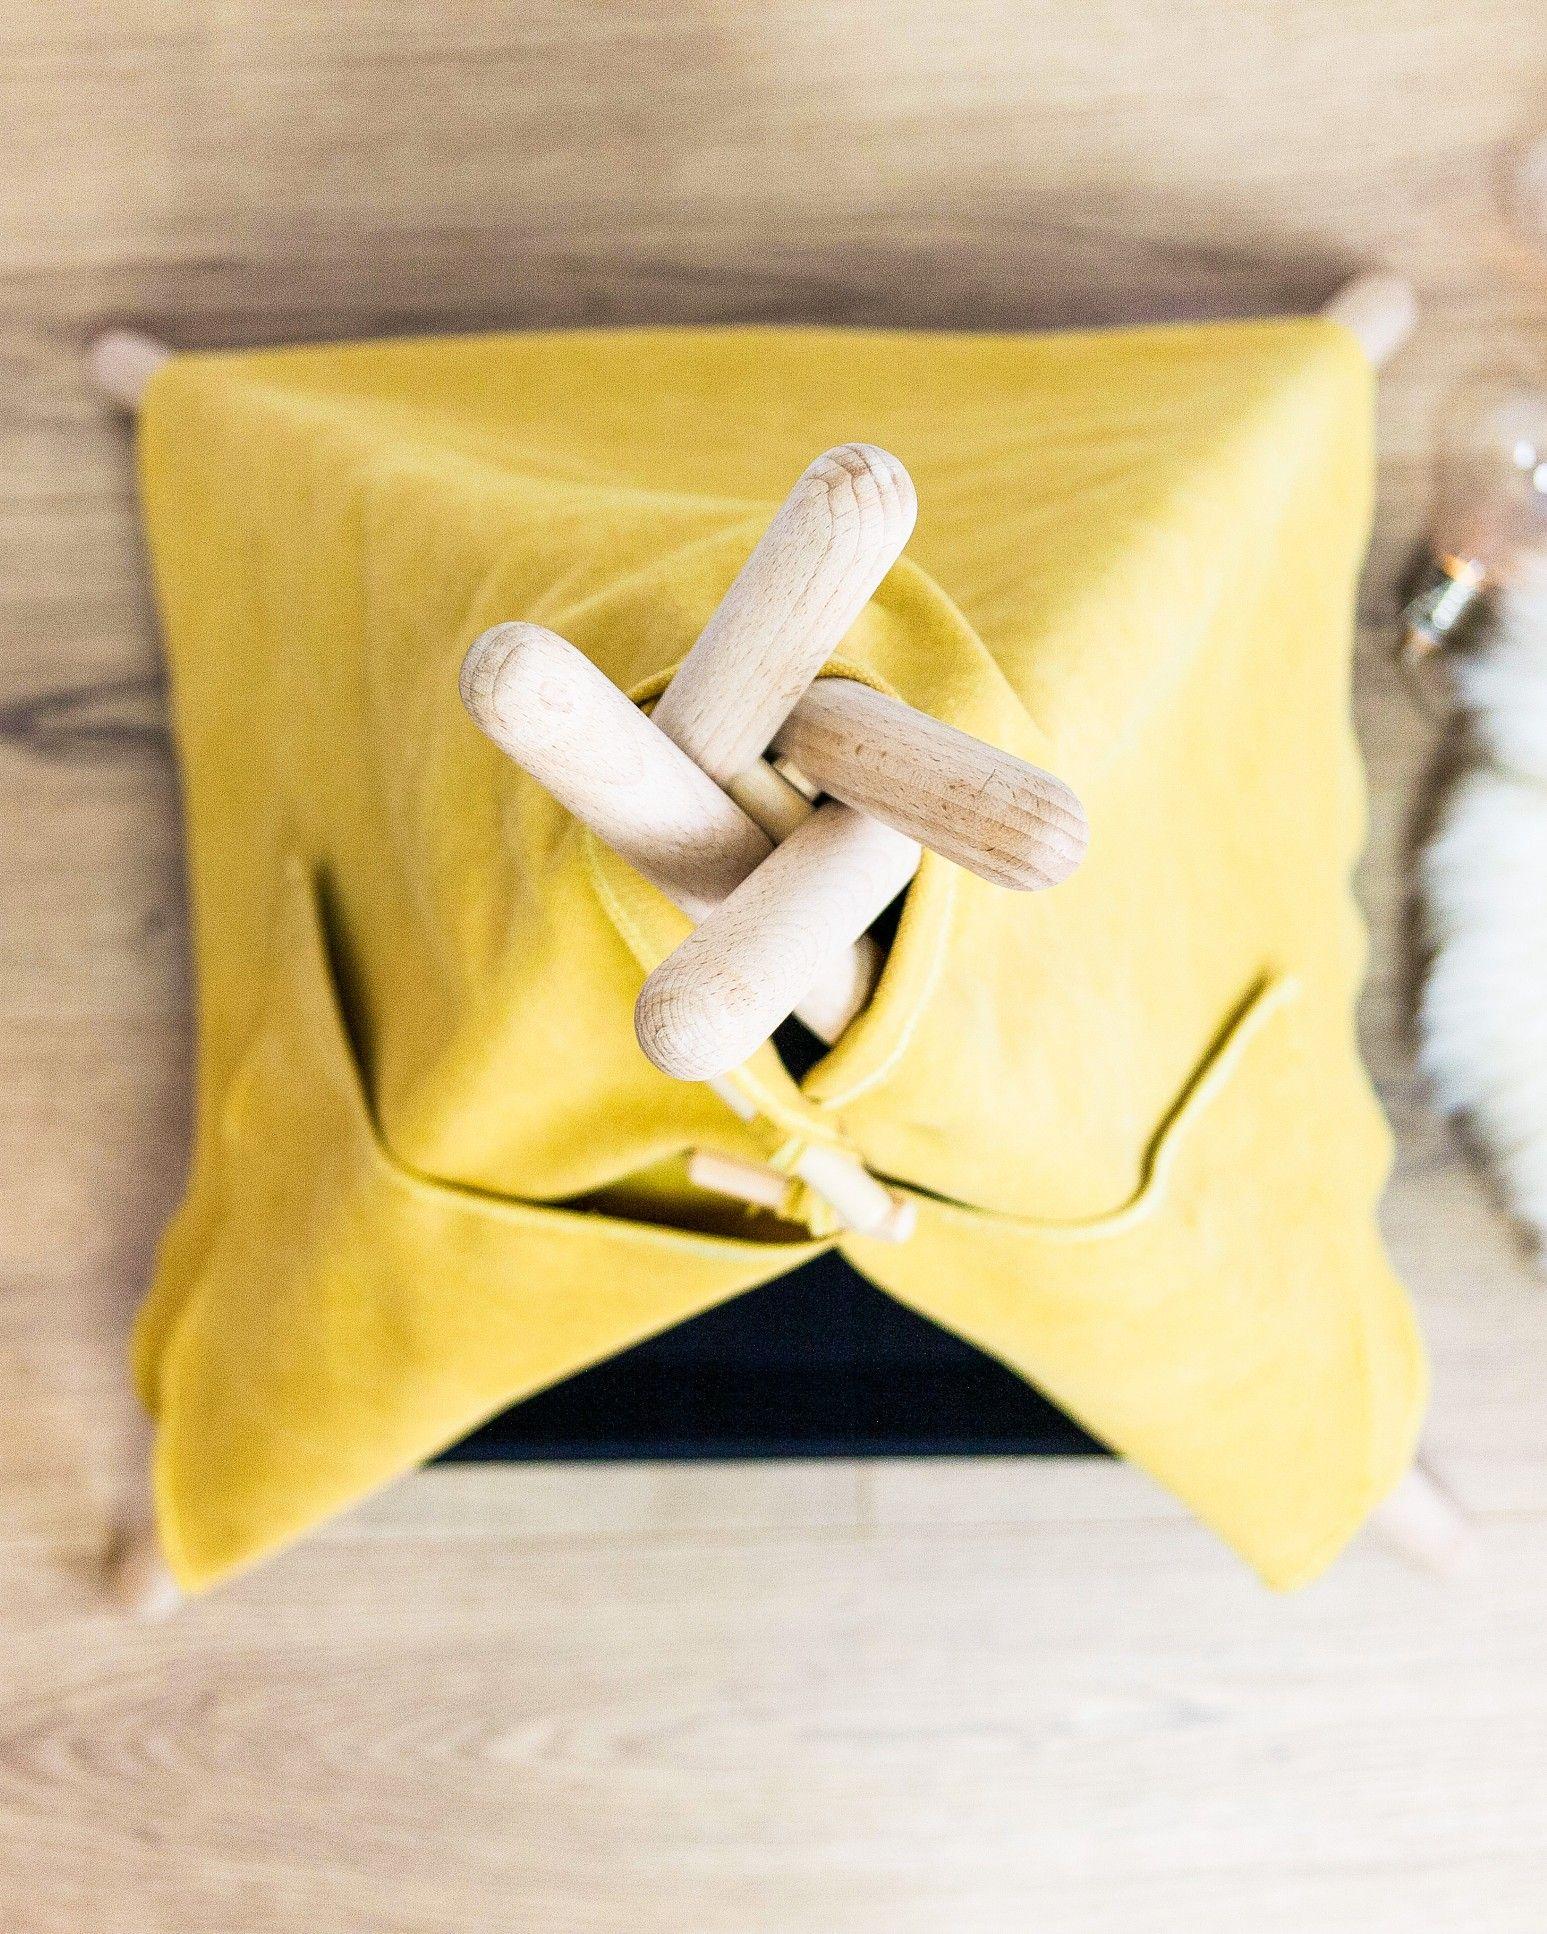 Yellow Cat House Wooden Cat House Light Bulb Cat Accessories Wooden Accessories Wooden Handmade Wooden Cat Teepee Wooden Cat Cat Teepee Wooden Cat House